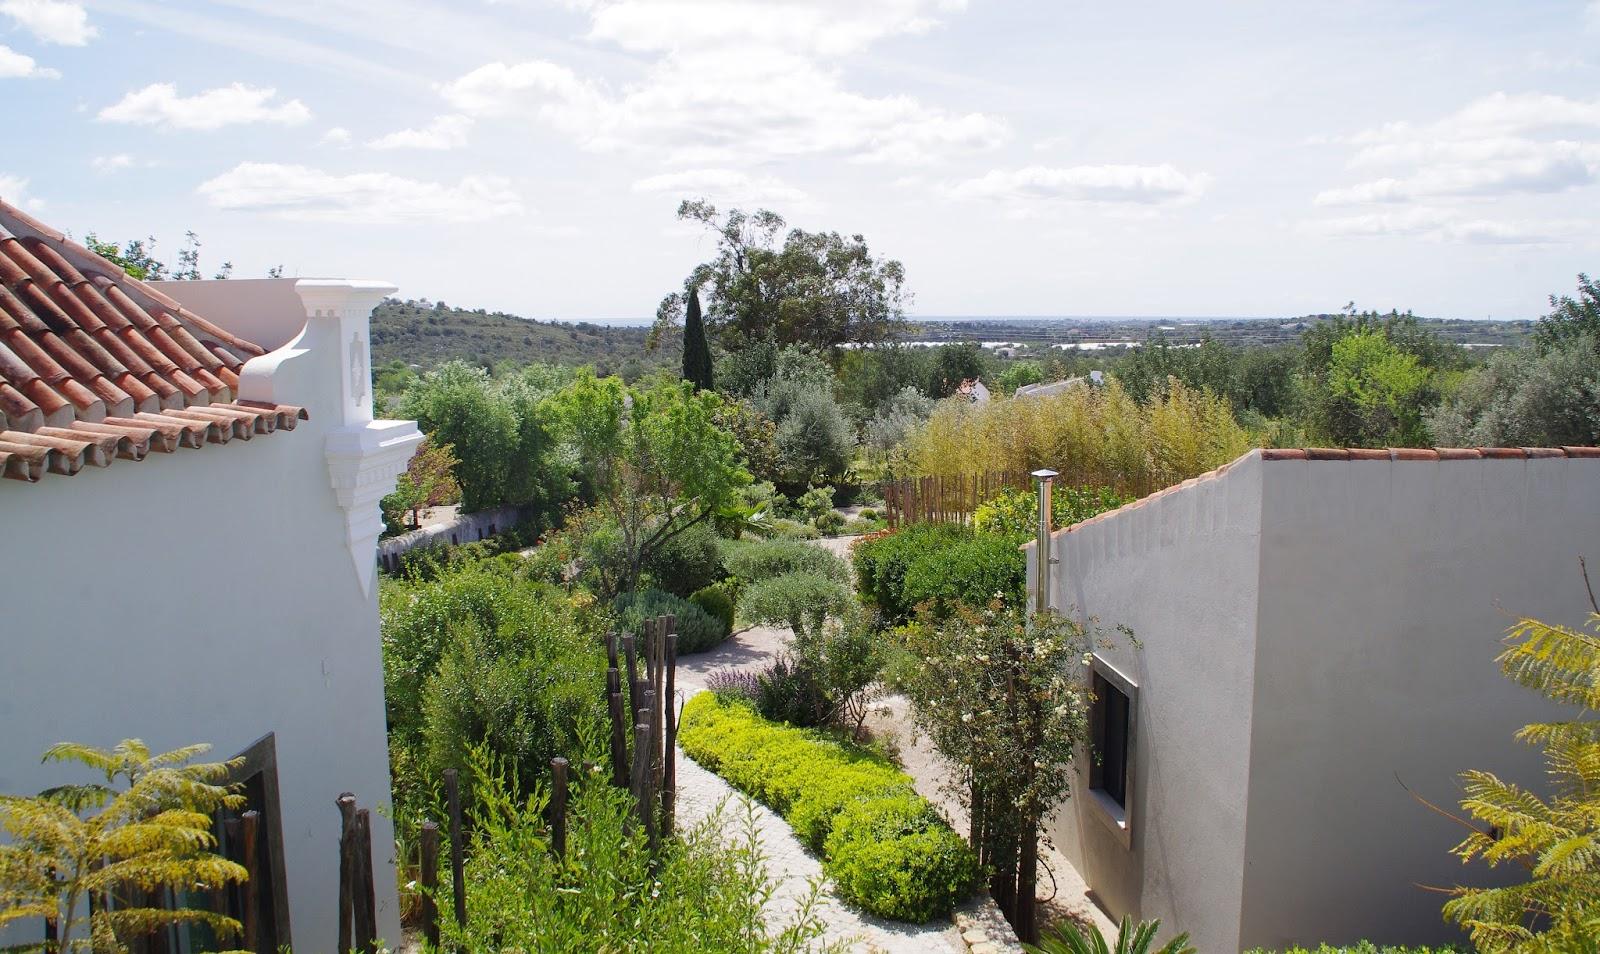 Fazenda Nova Country House Algarve